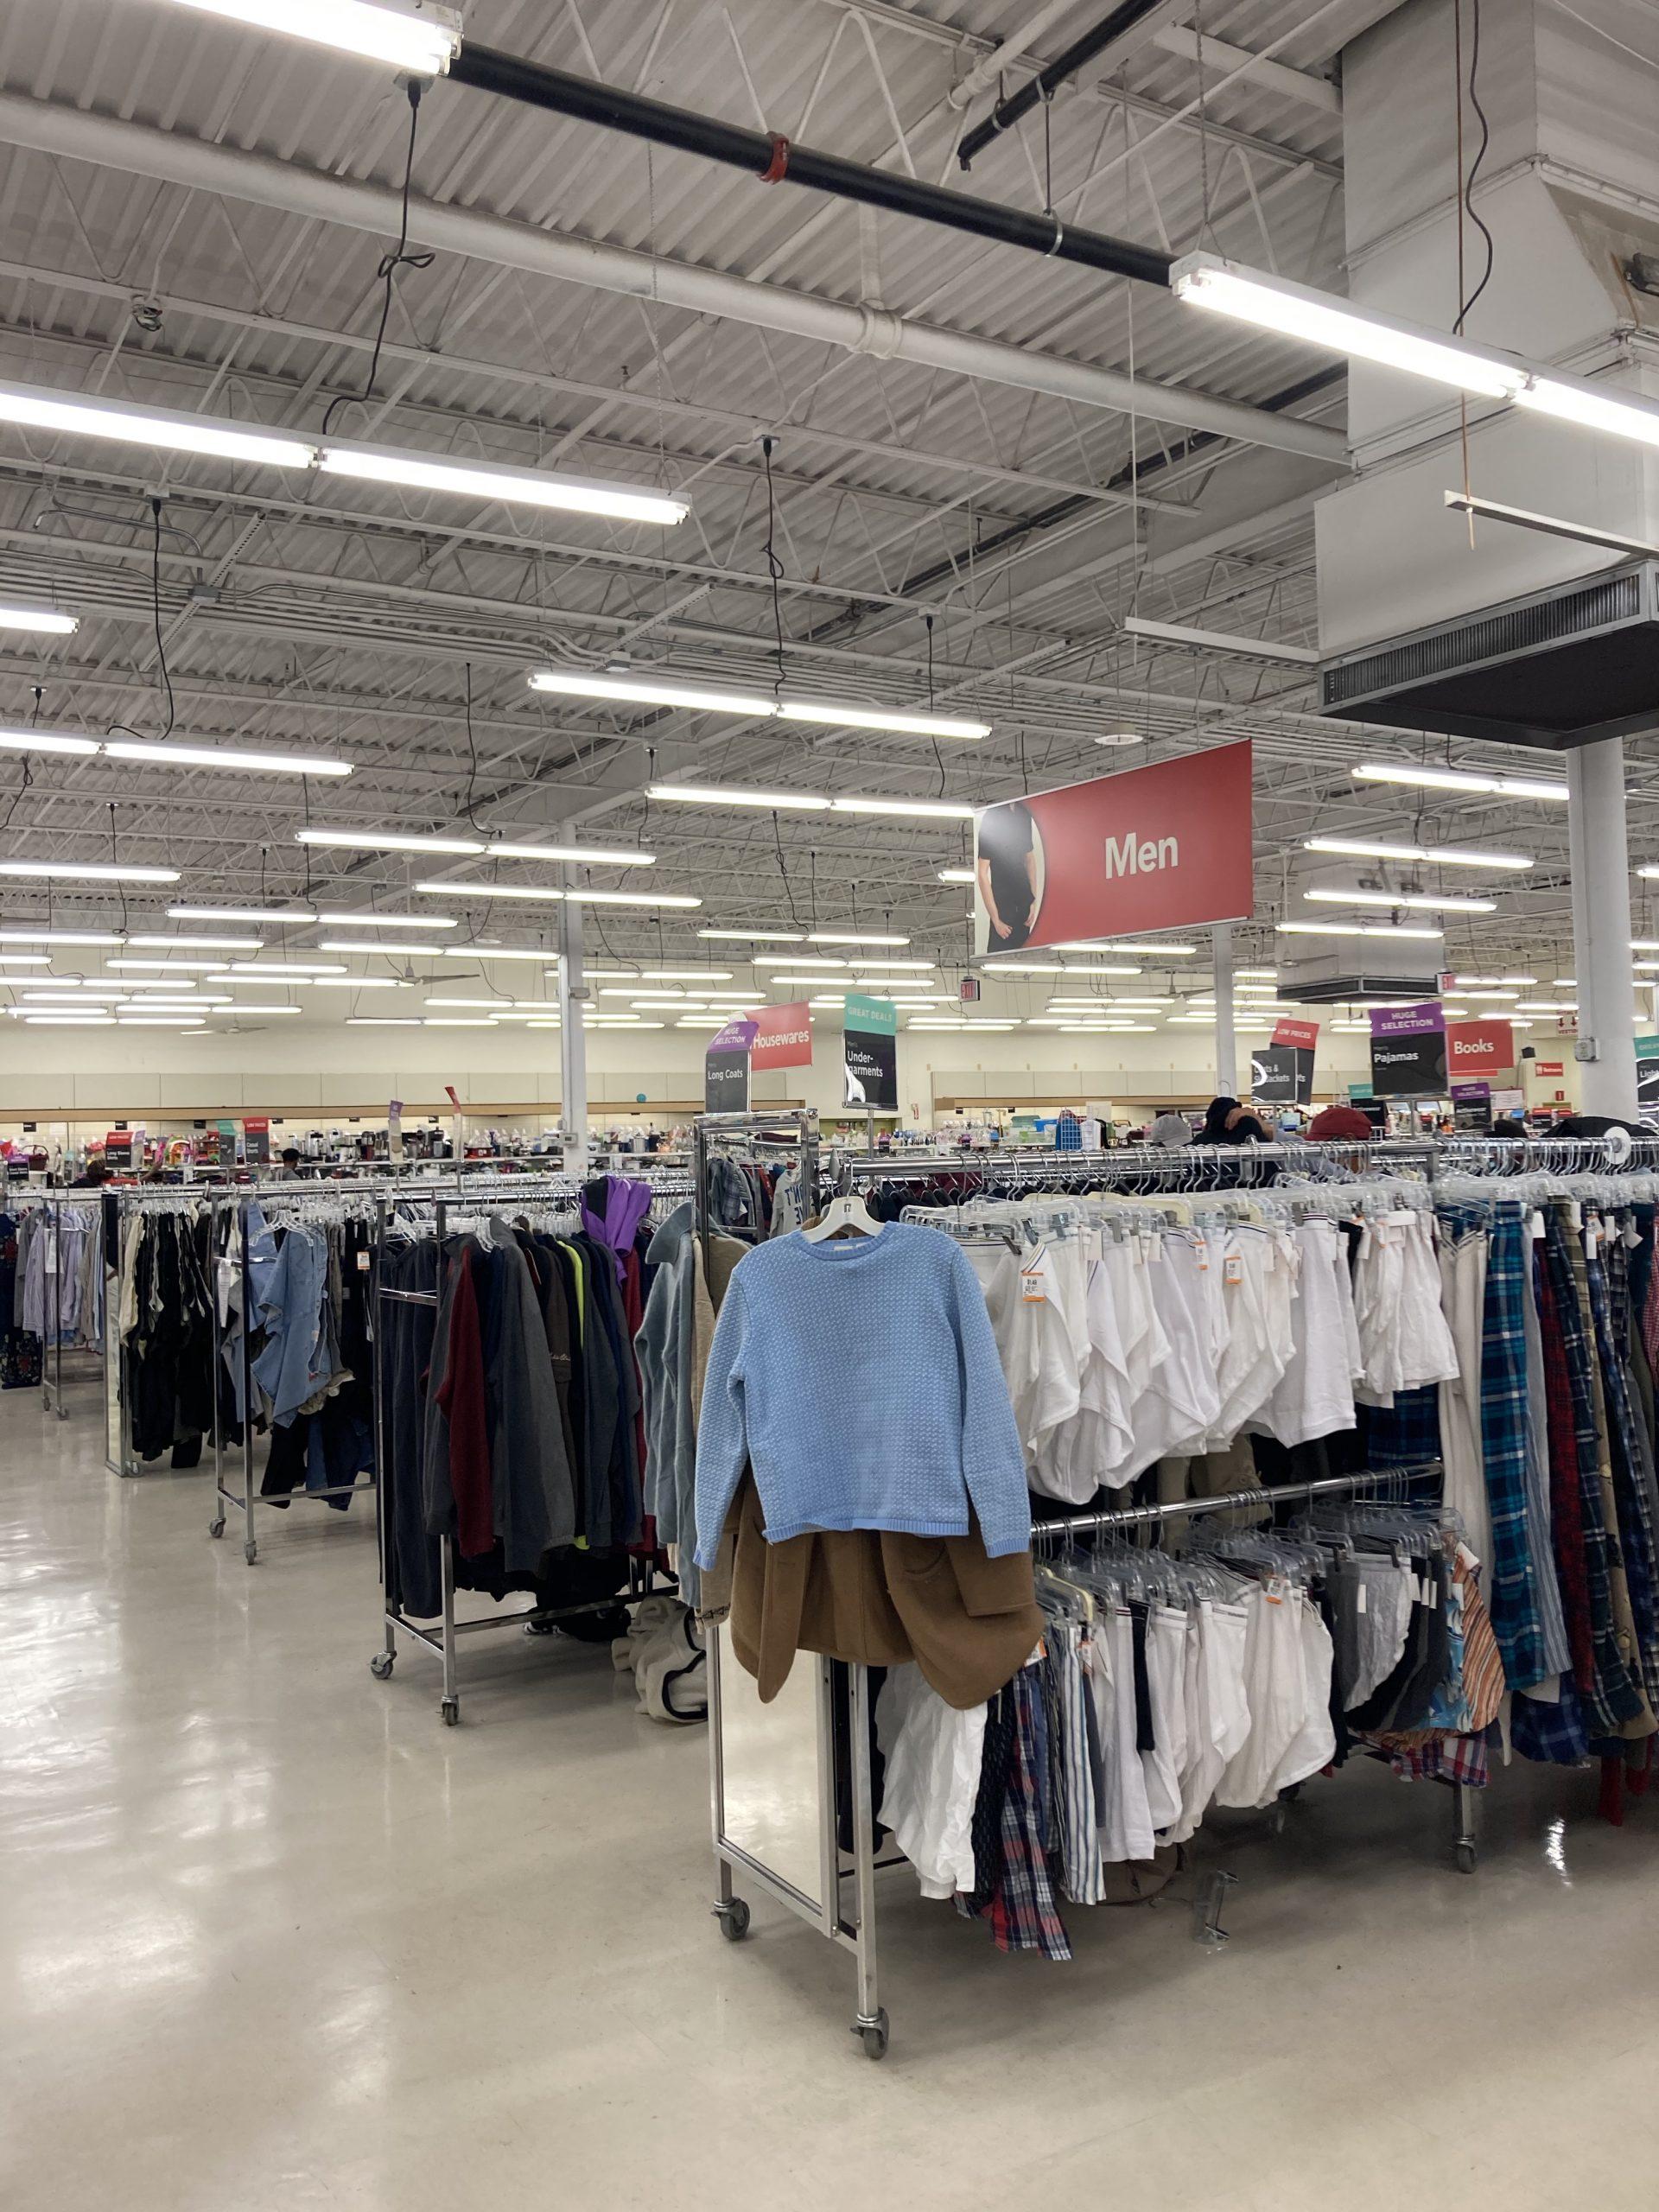 Value Village shirt section